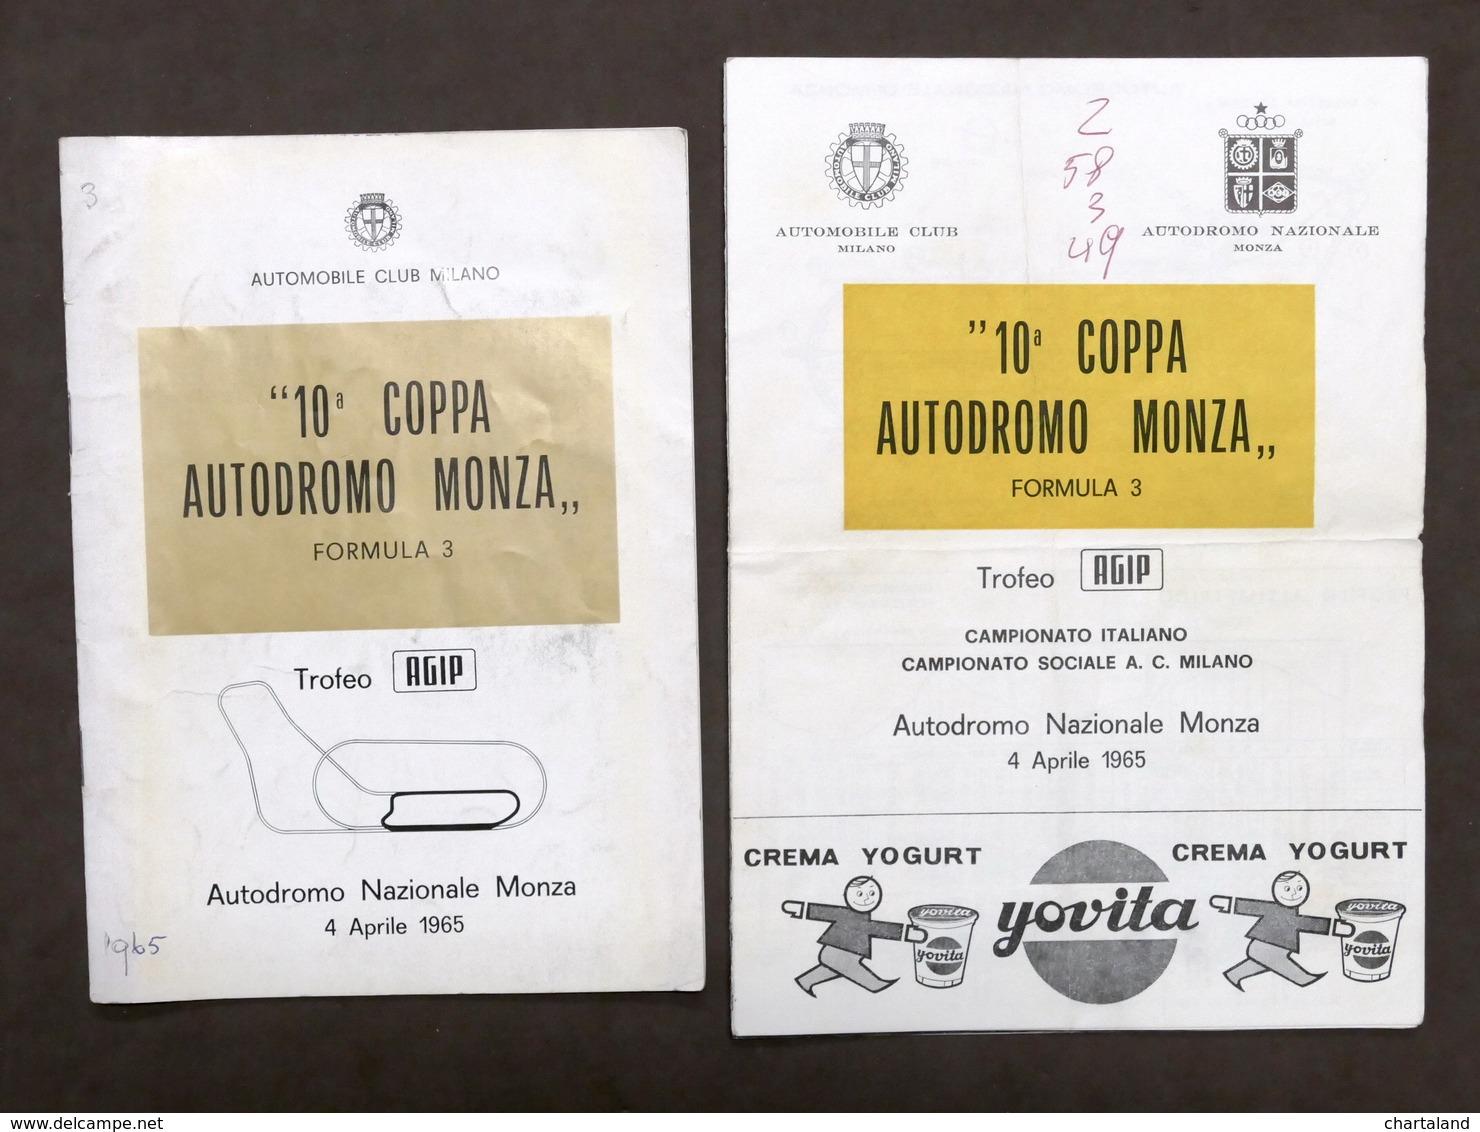 10^ Coppa Autodromo Monza - Formula 3 - Trofeo Agip - Aprile 1965 - Regolamento - Other